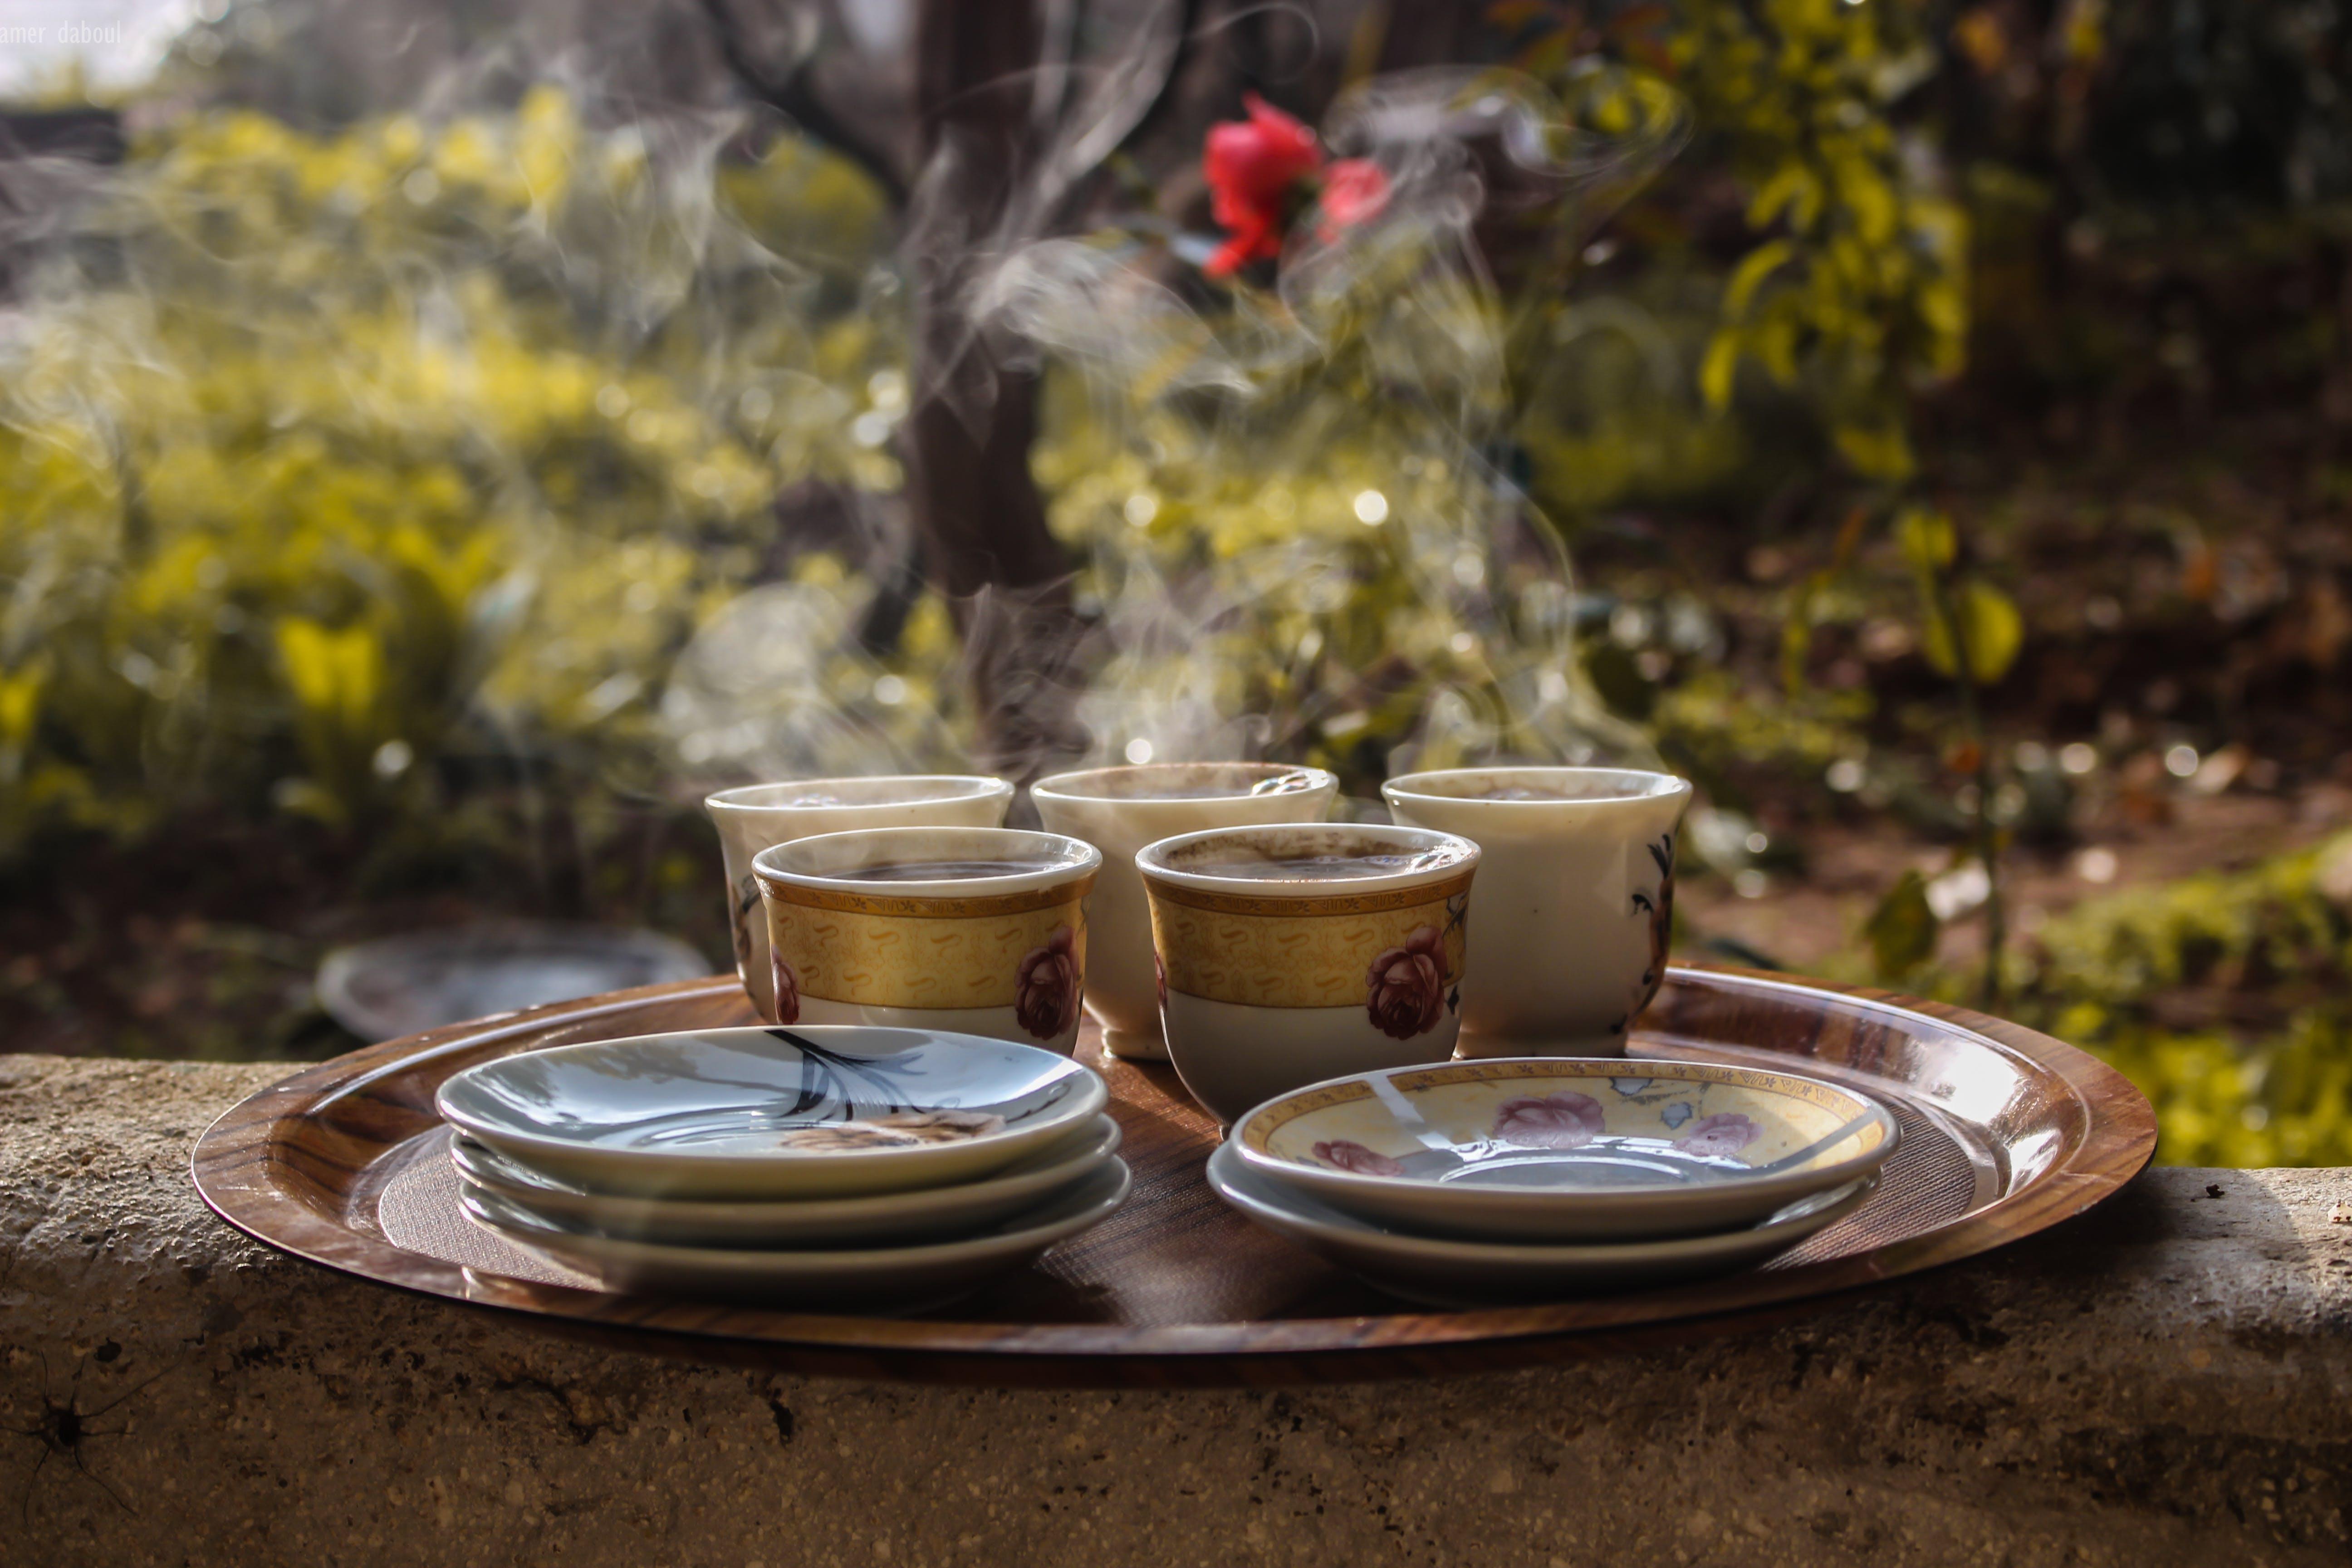 Brown Ceramic Teacups Beside Saucers on Brown Serving Plate